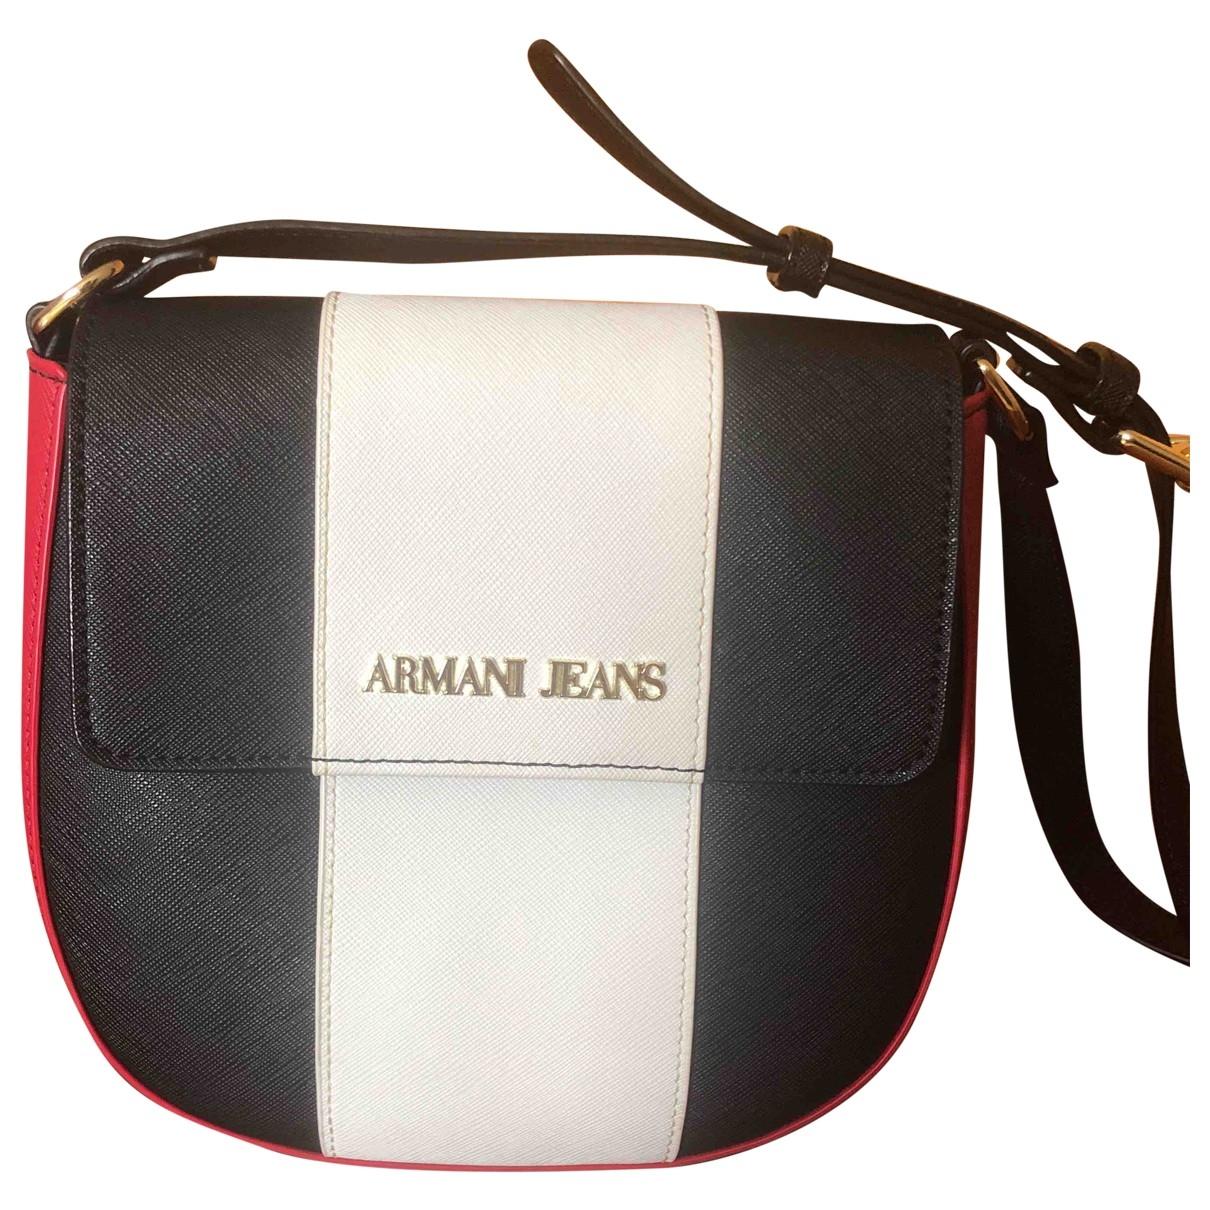 Armani Jeans \N Multicolour Patent leather handbag for Women \N